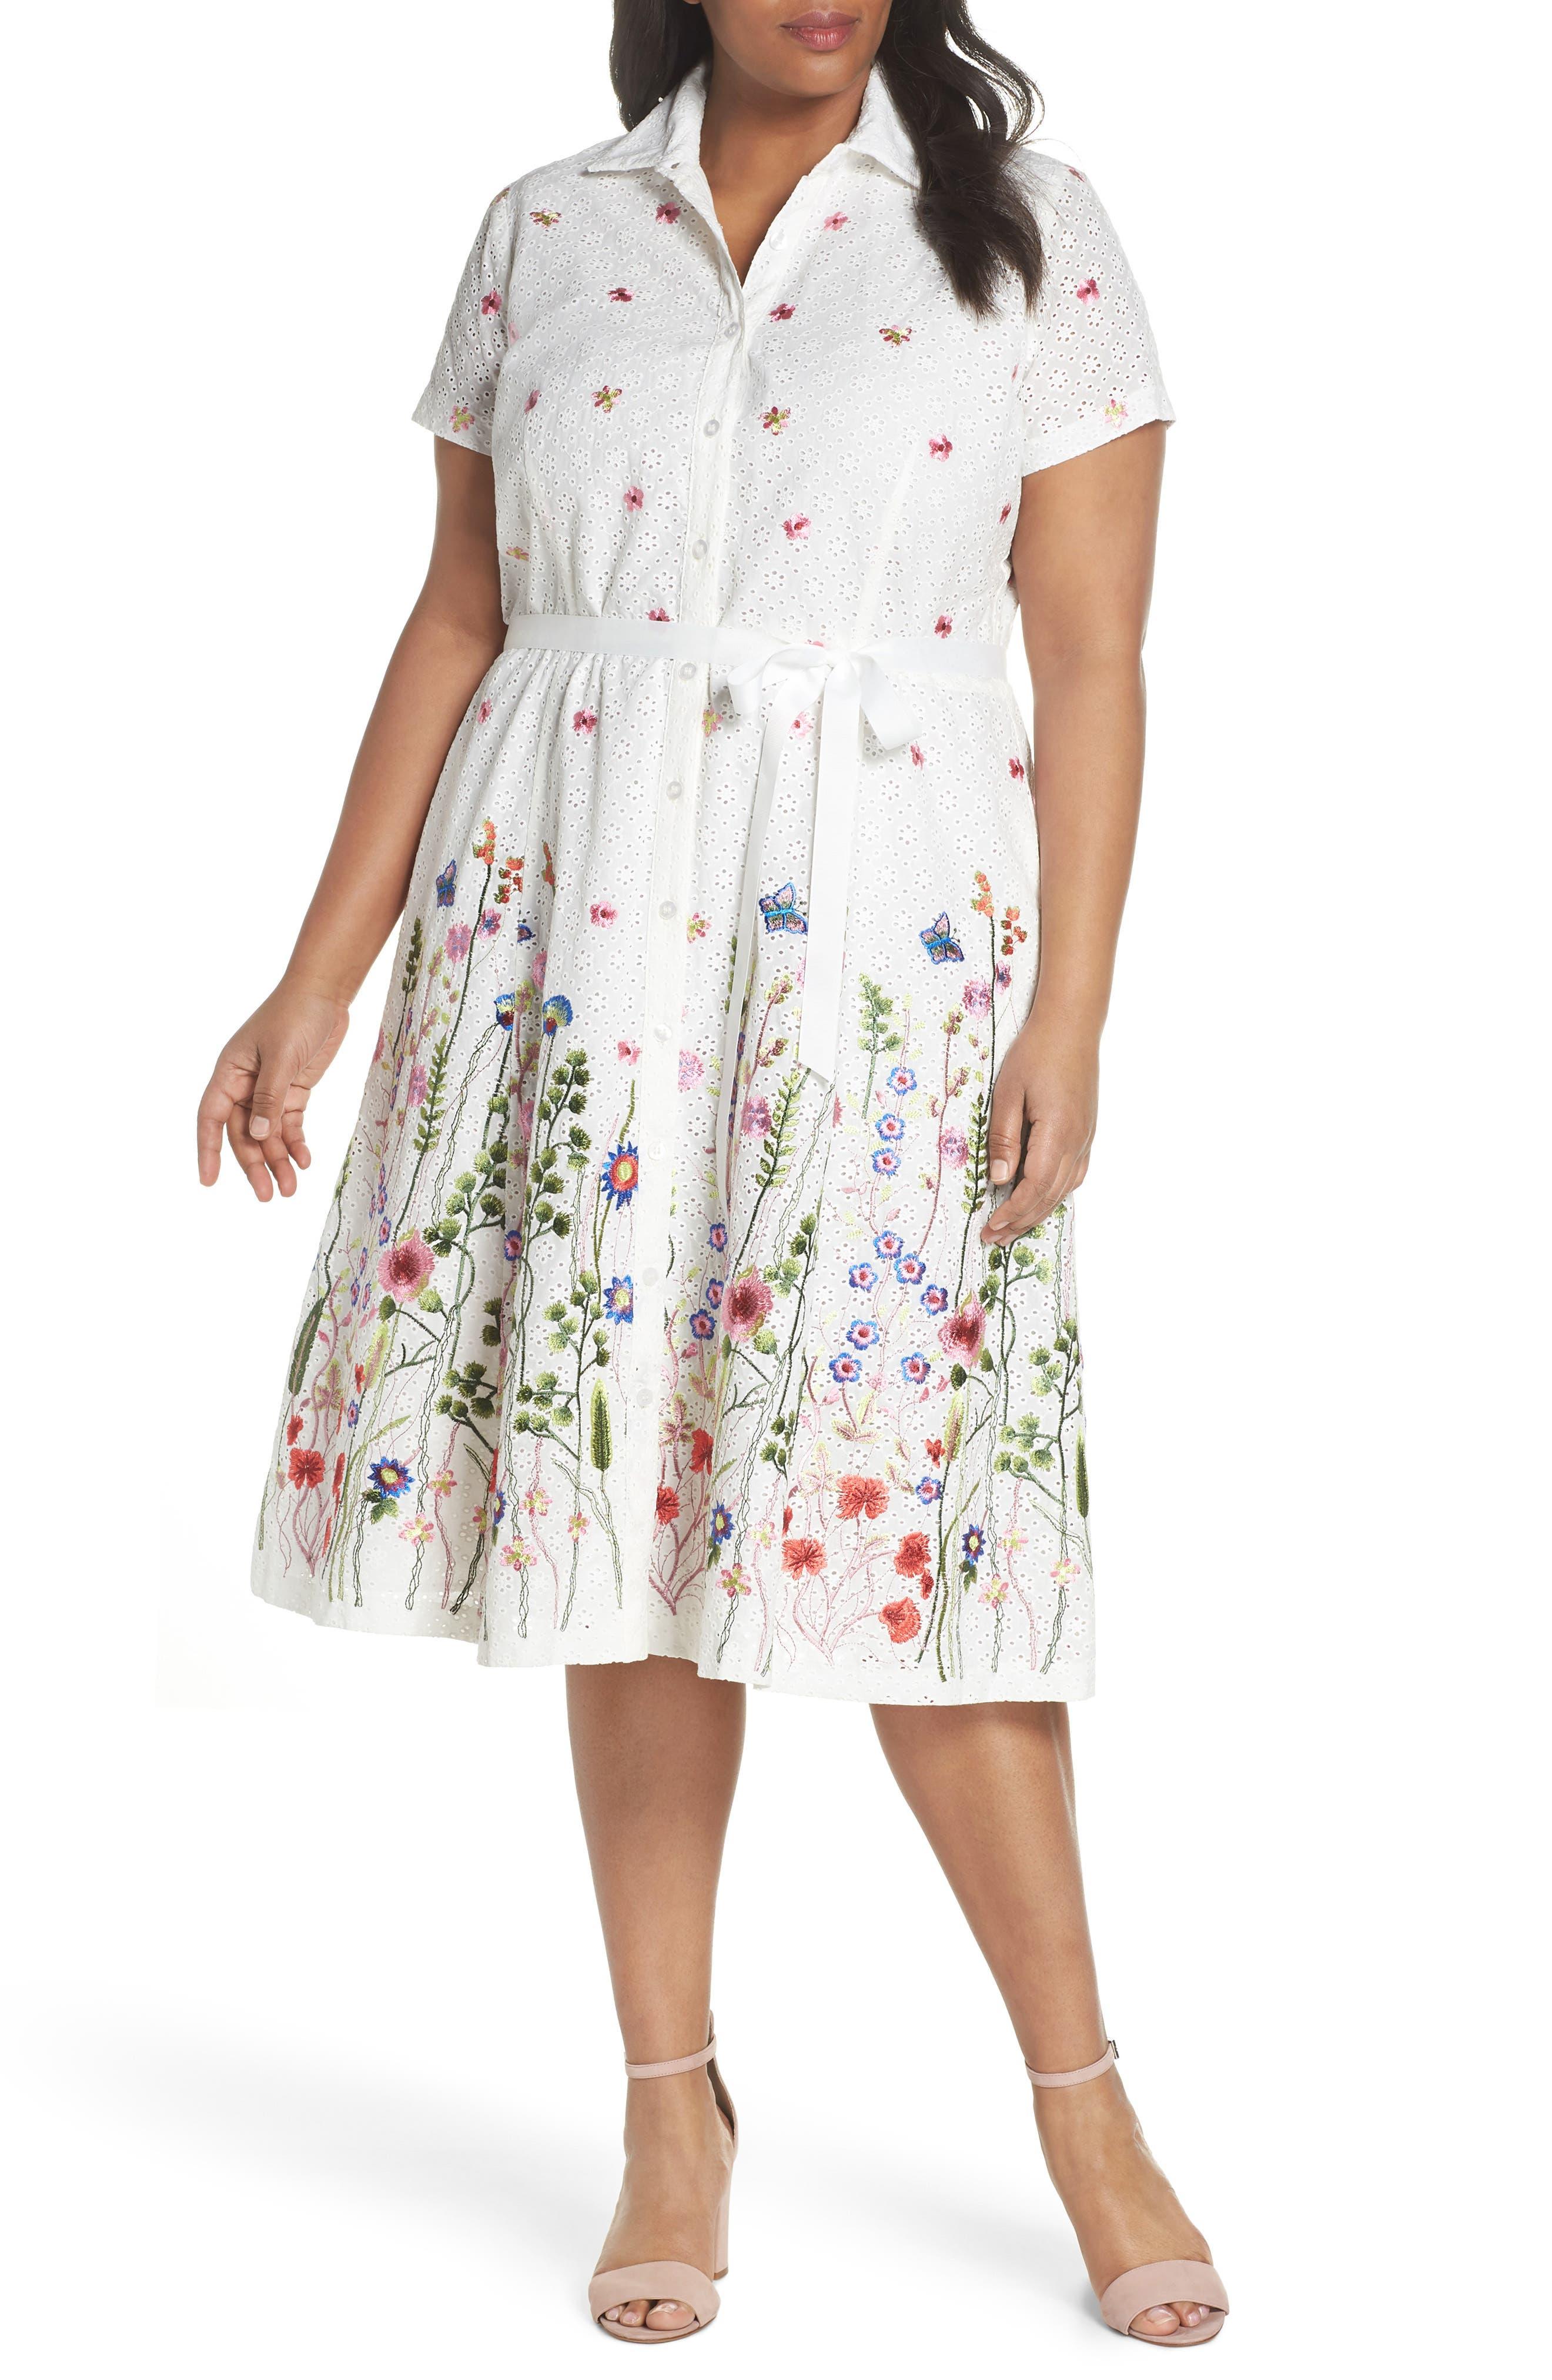 Floral Embroidered Eyelet Shirtdress,                             Main thumbnail 1, color,                             White/ Royal/ Green